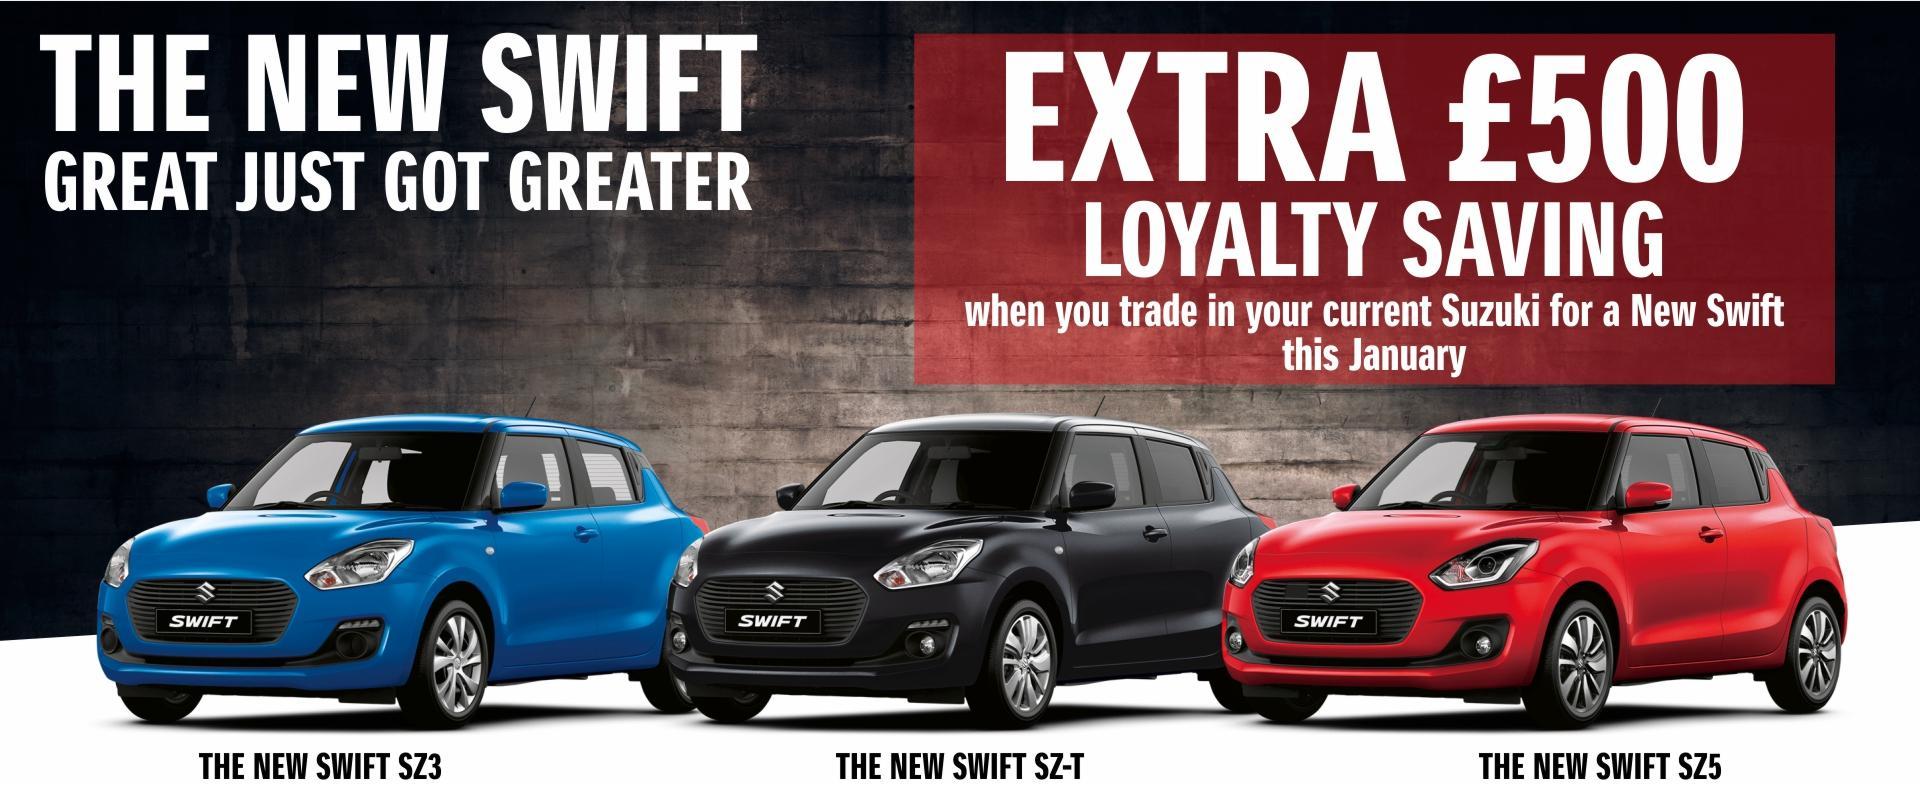 Extra £500 Loyalty Bonus on Swifts in January